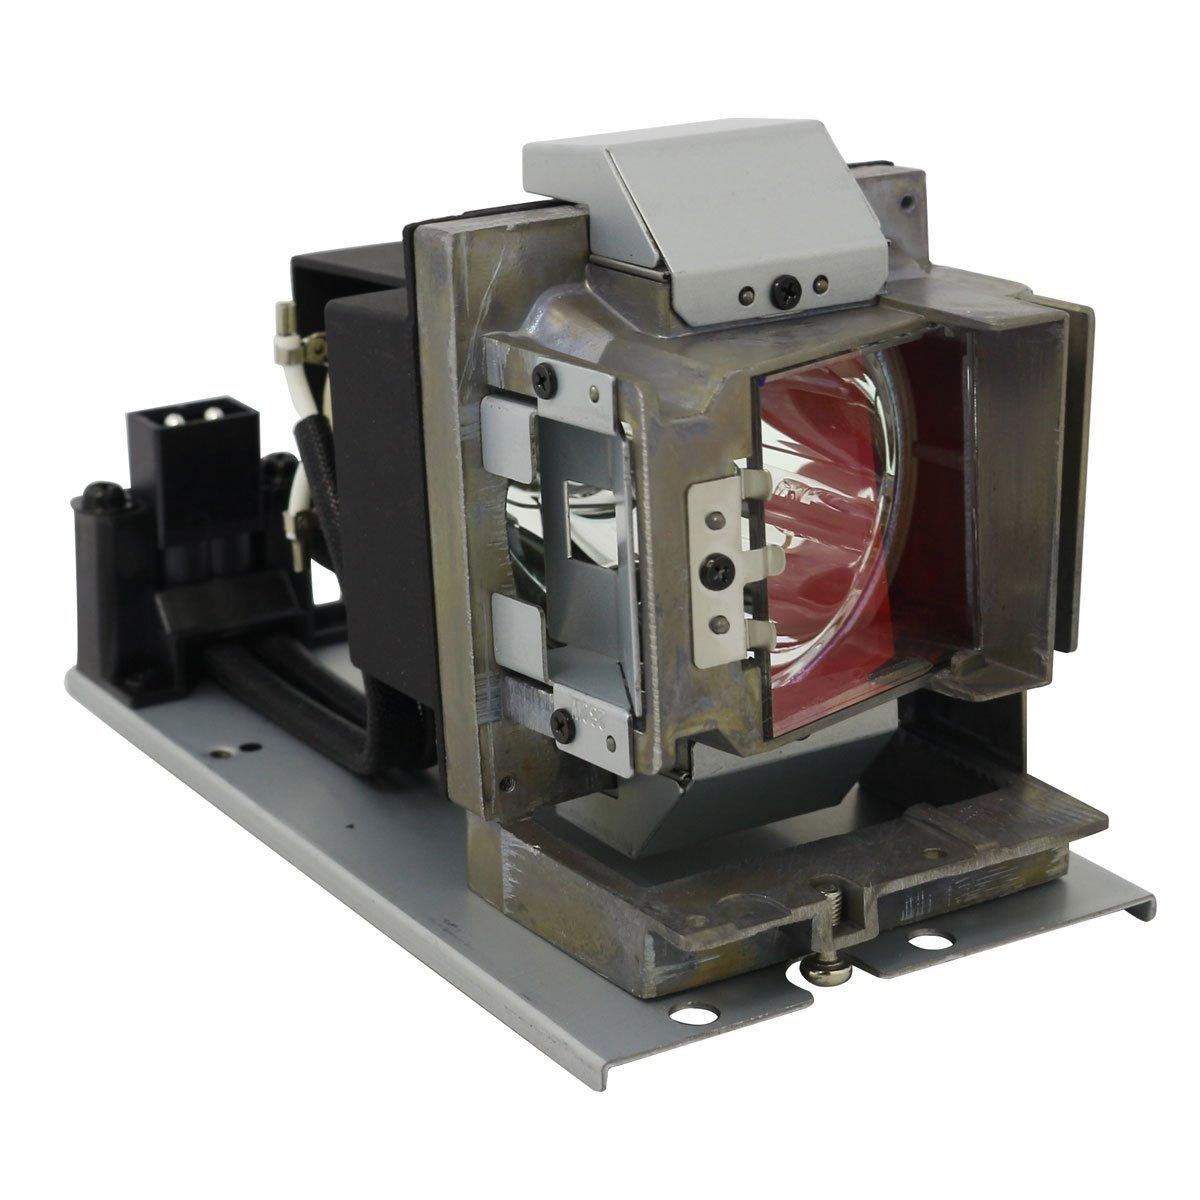 Projector Lamp Bulb 5J.J9M05.001 for BENQ W1300 MX666 MX666+ with housing original projector lamp cs 5jj1b 1b1 for benq mp610 mp610 b5a